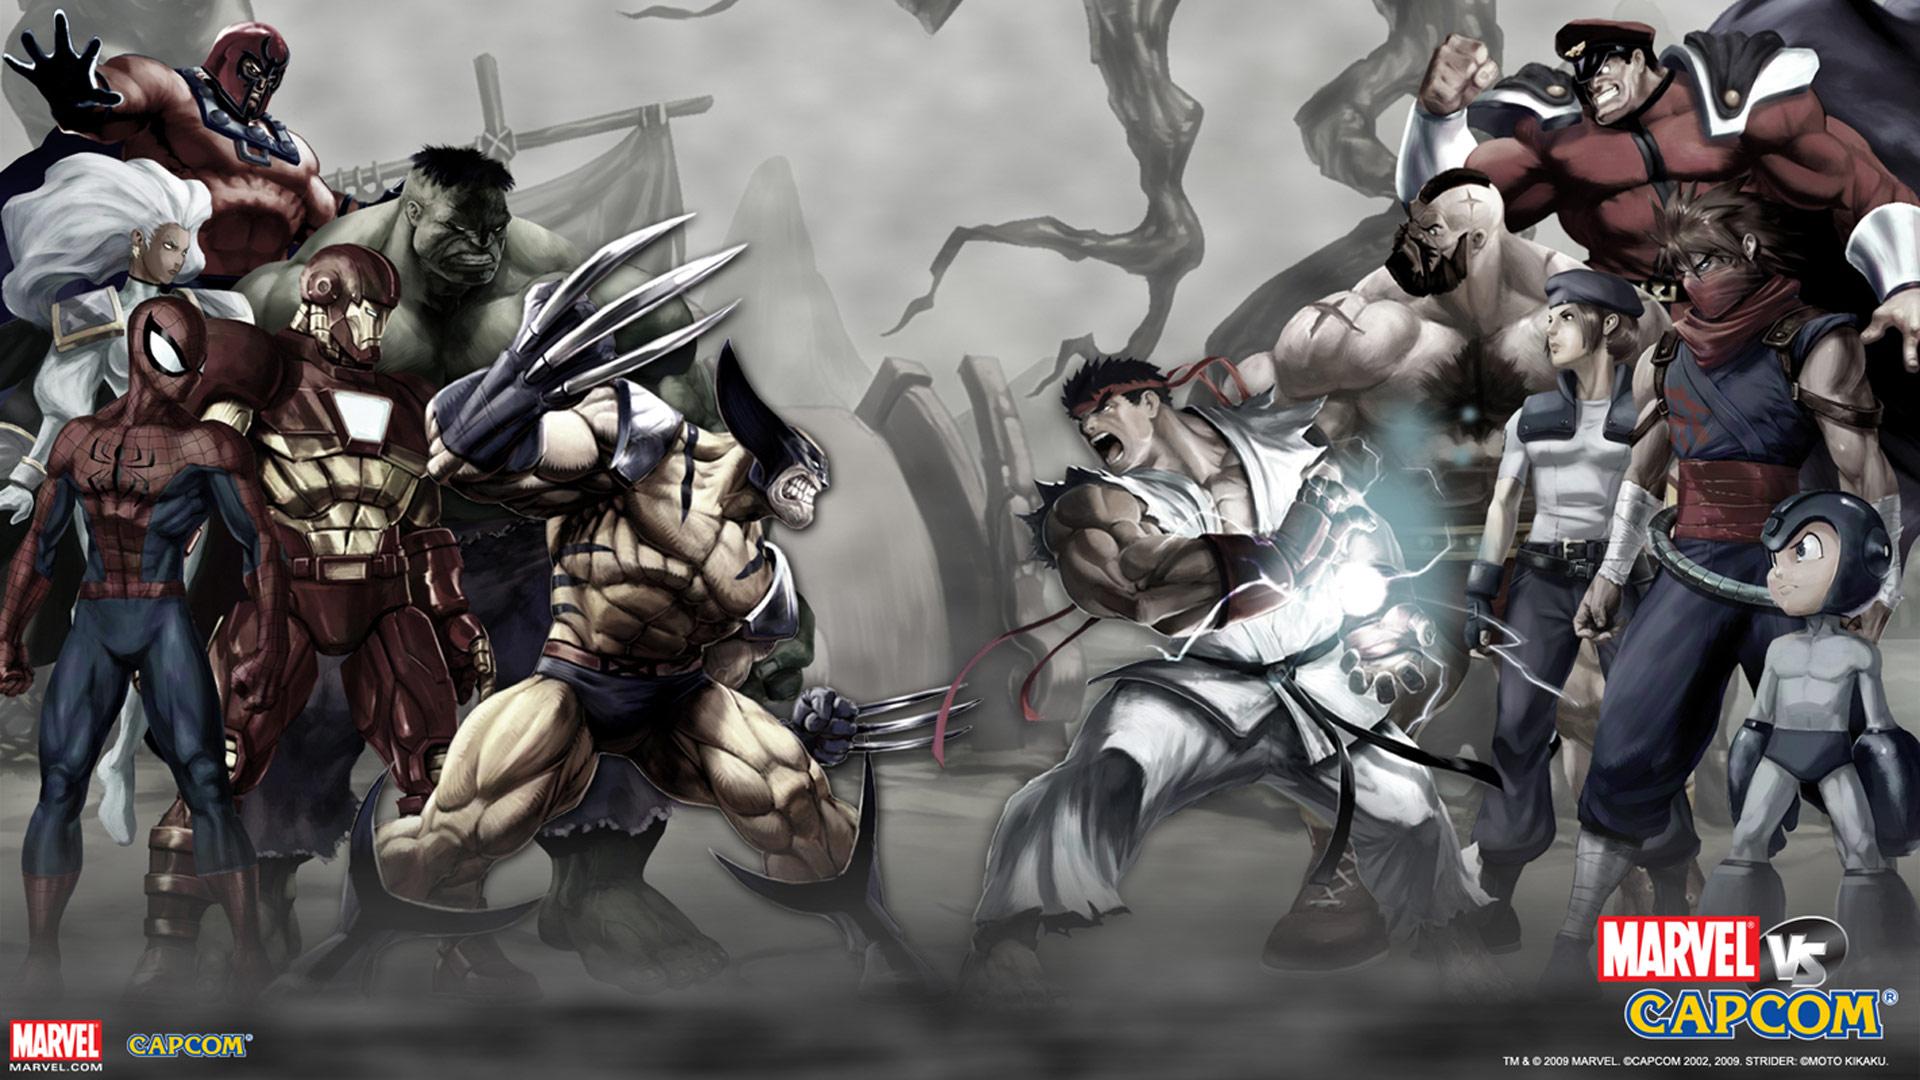 Marvel Vs Capcom 2 Wallpaper Artwork